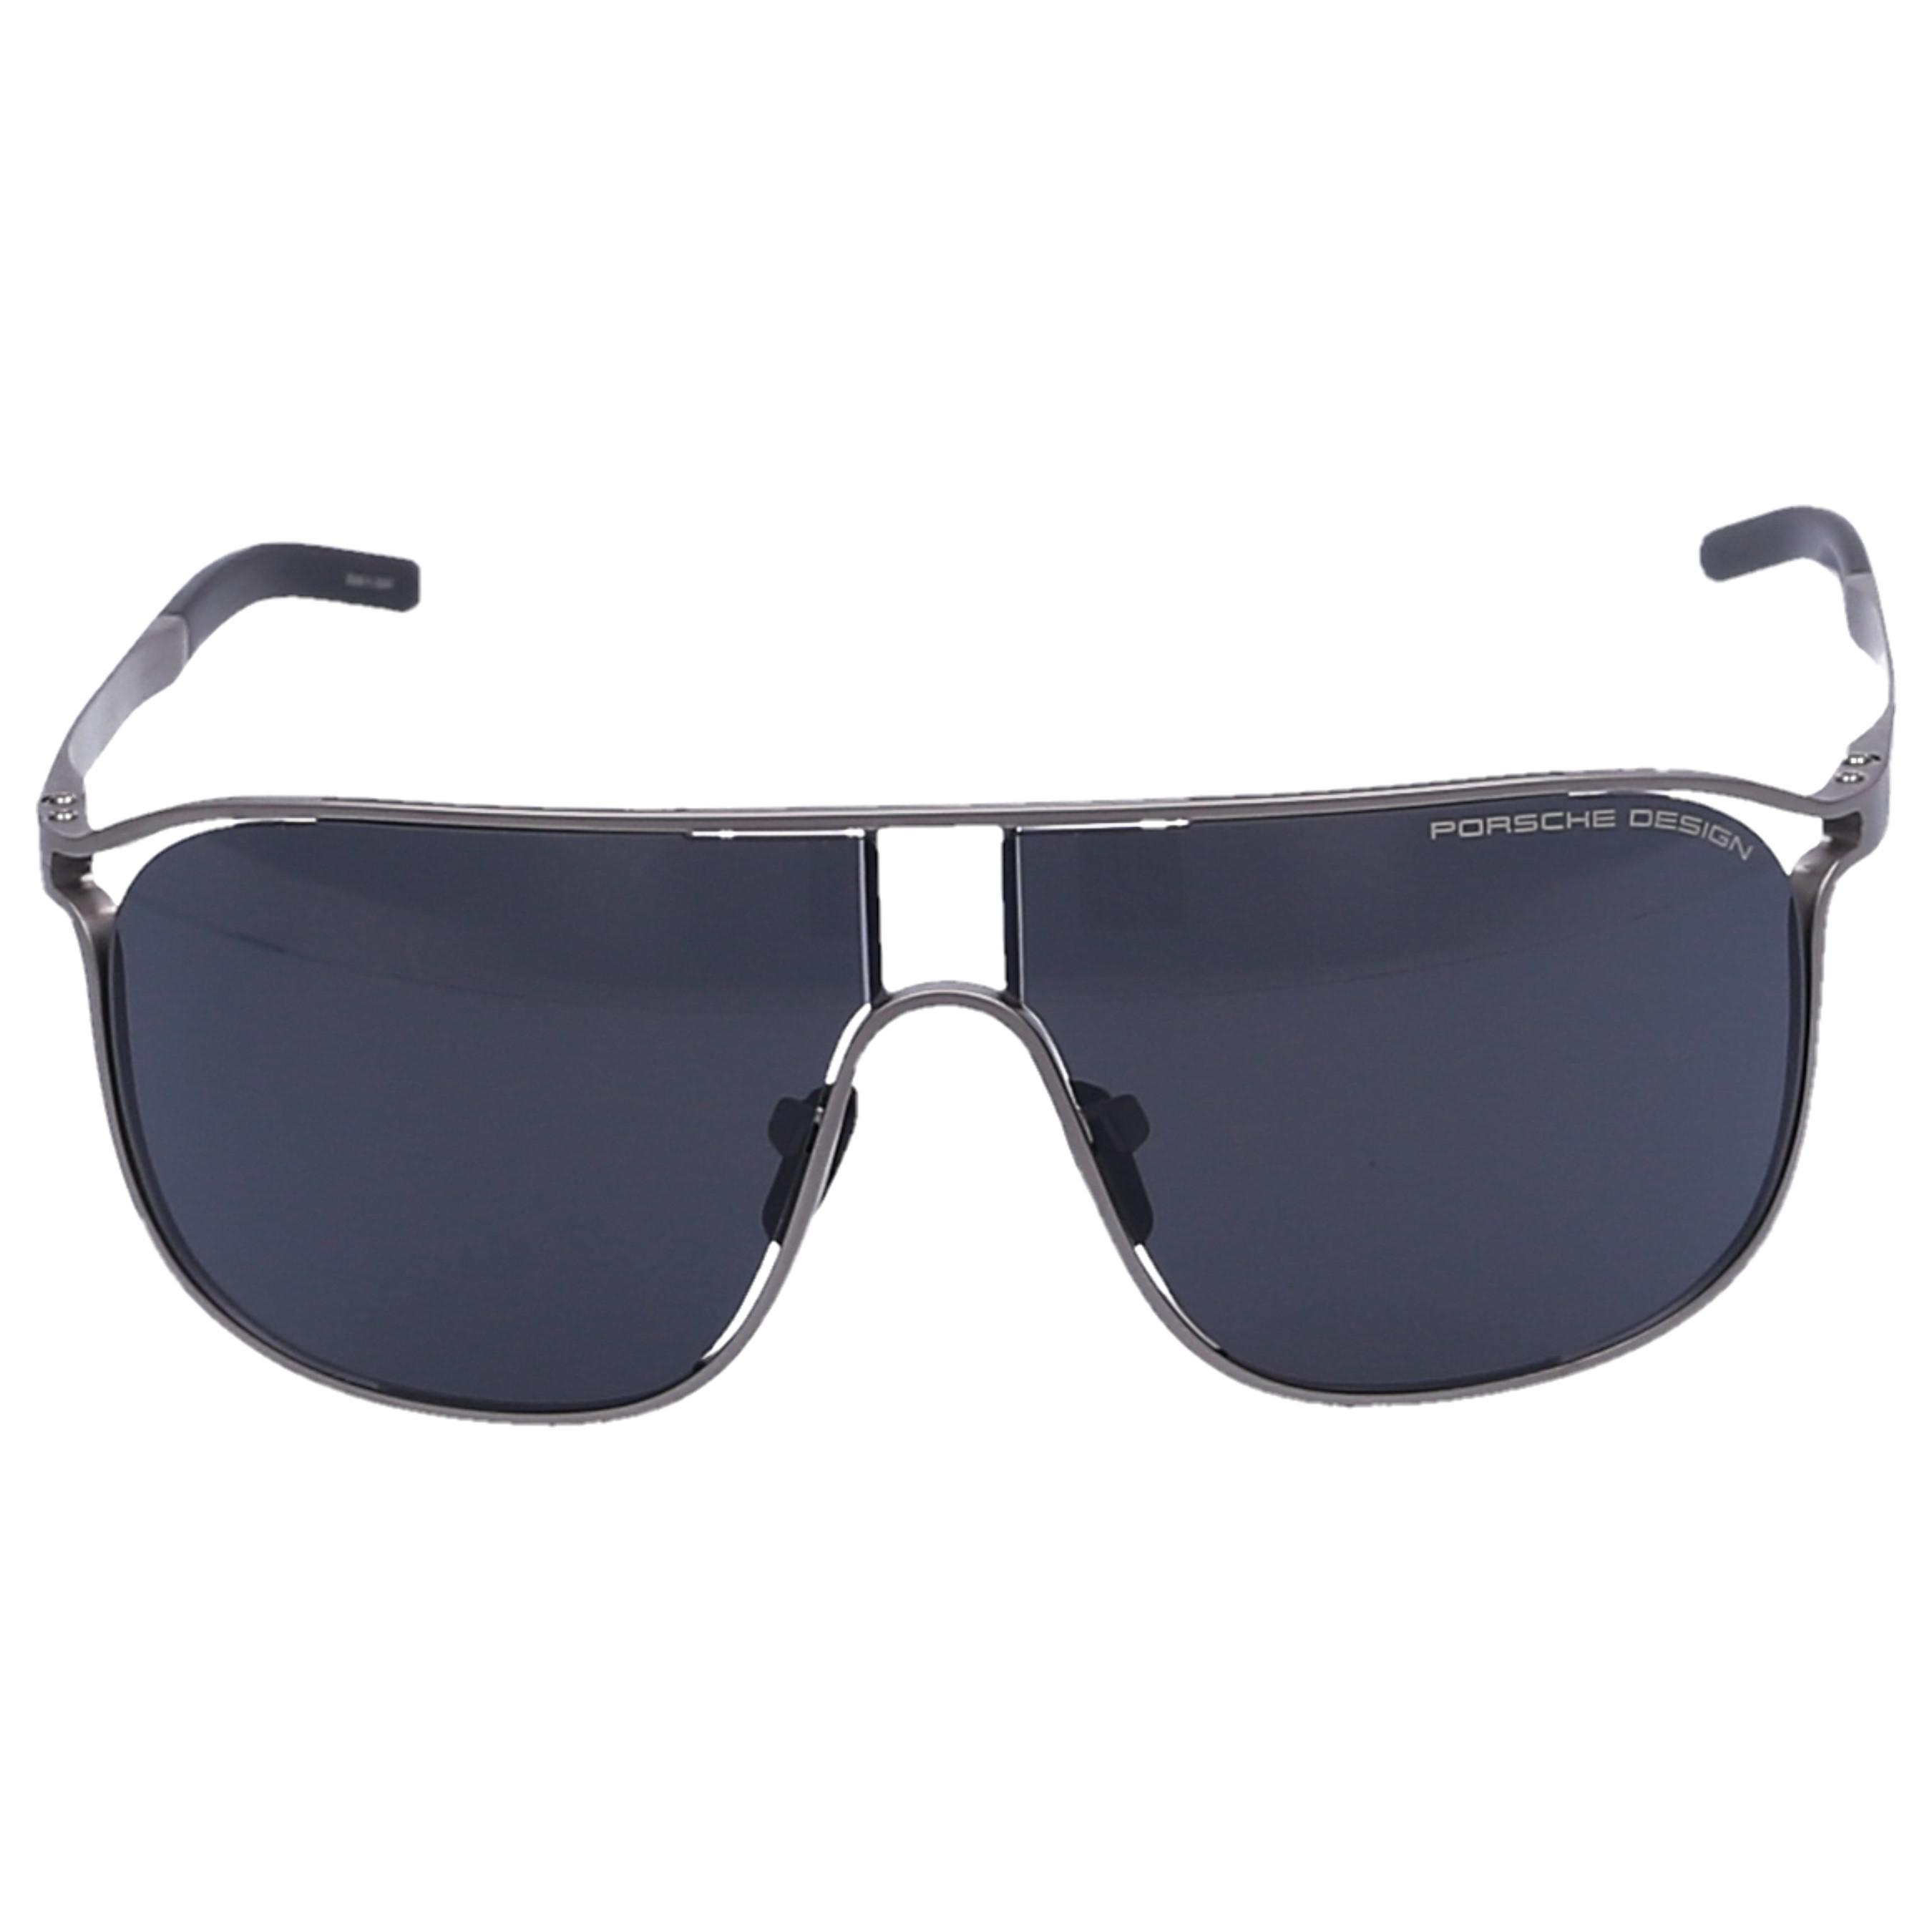 f1953d21416 Lyst - Porsche Design Men Sunglasses Aviator 8663 Titanium Silver in ...